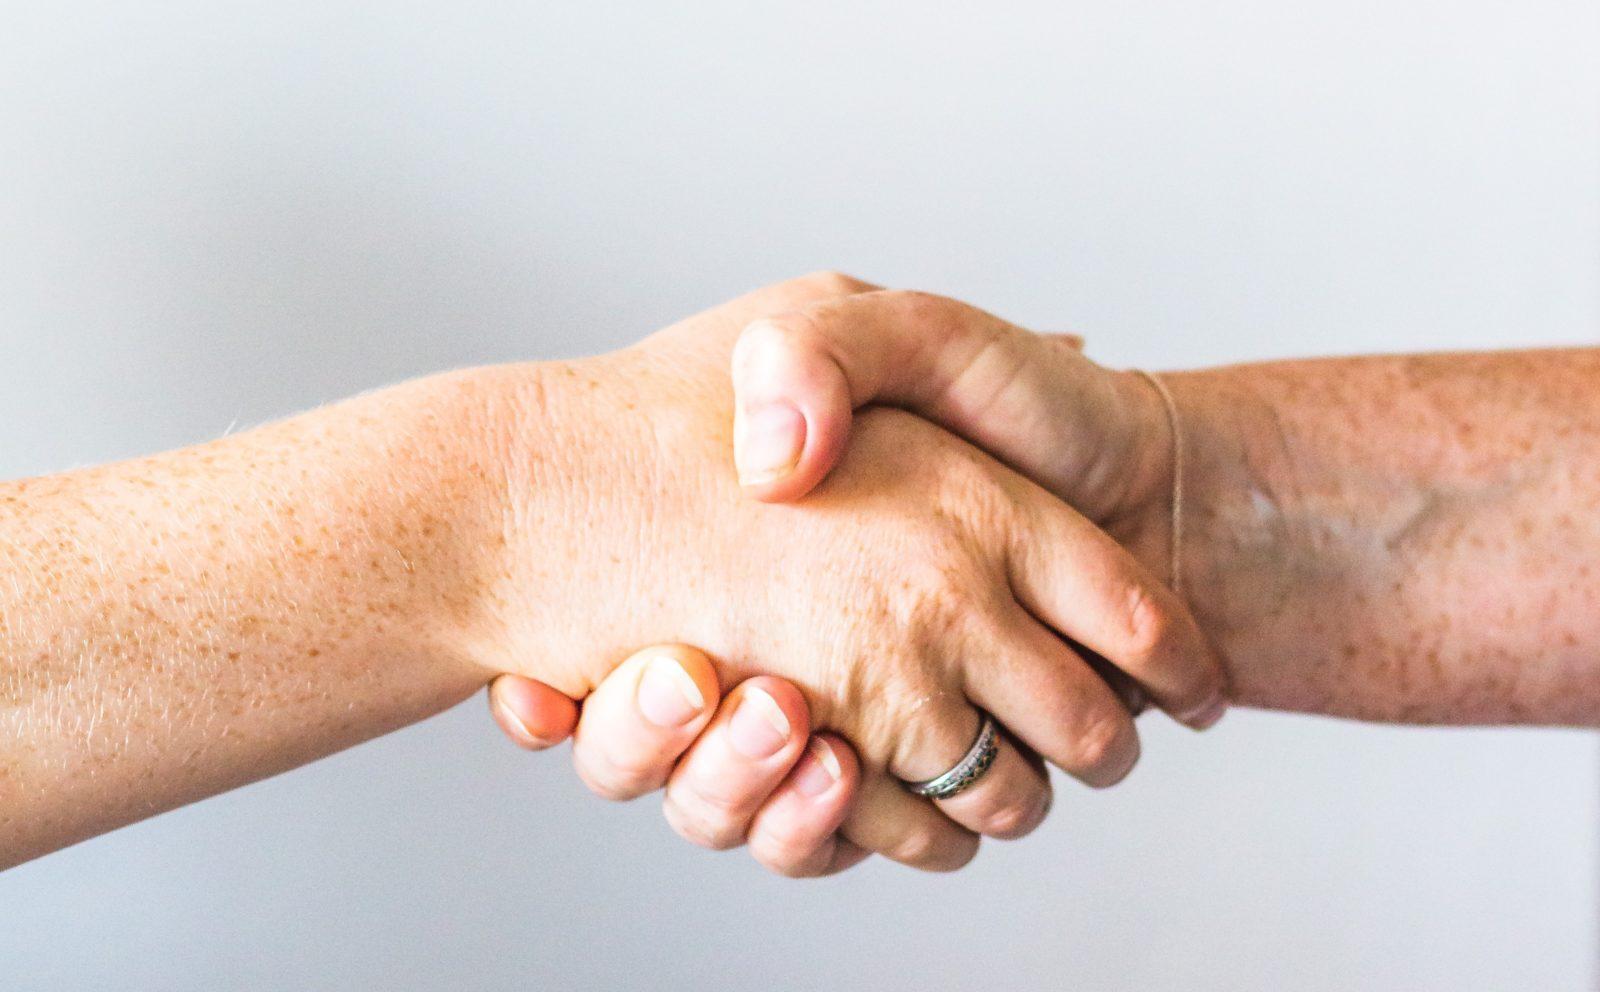 Shaking hands - sincerely-media-EtyBBUByPSQ-unsplash